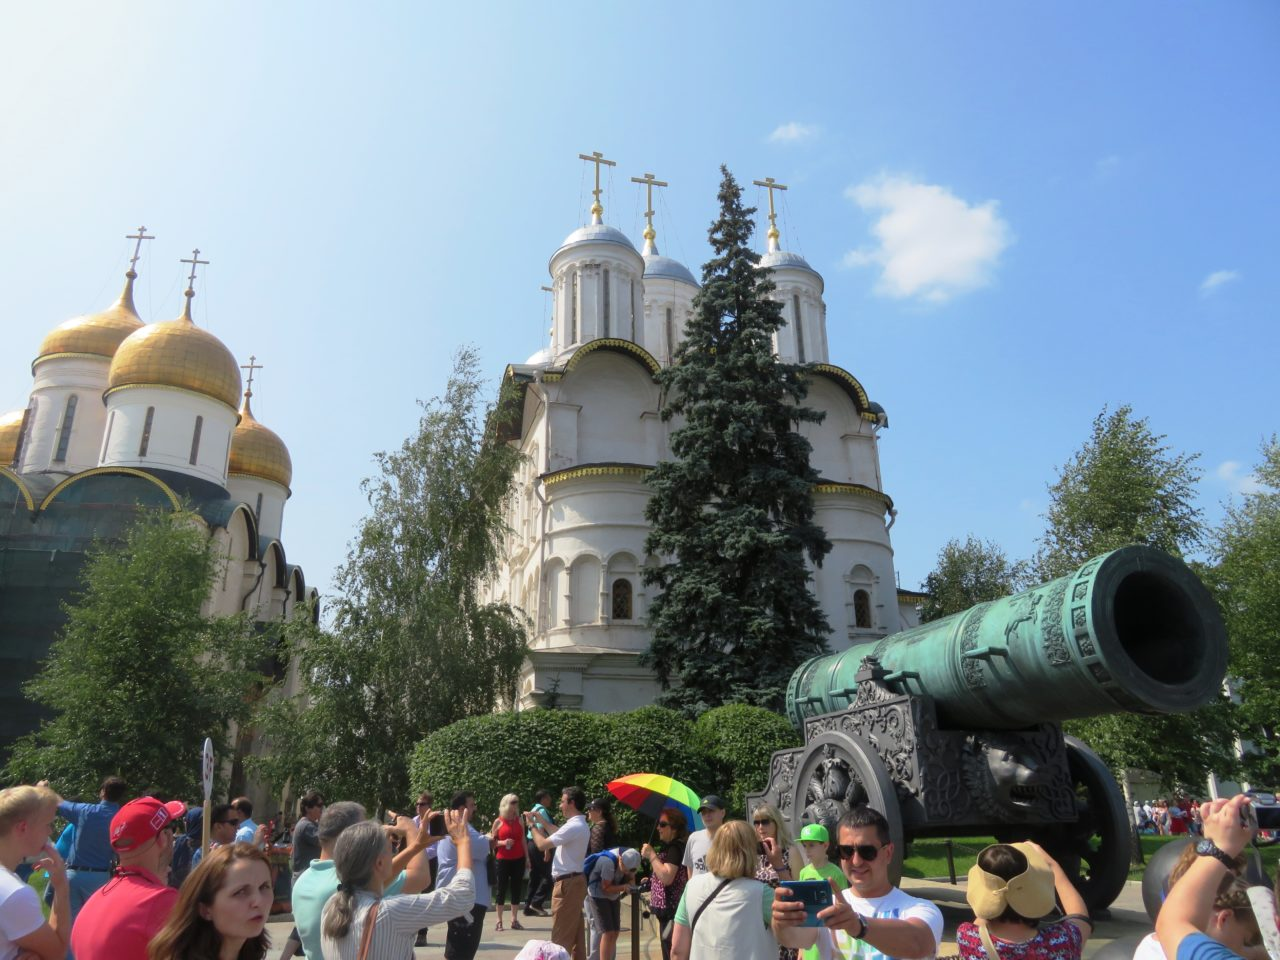 Inside the Kremlin walls in Moscow, Russia